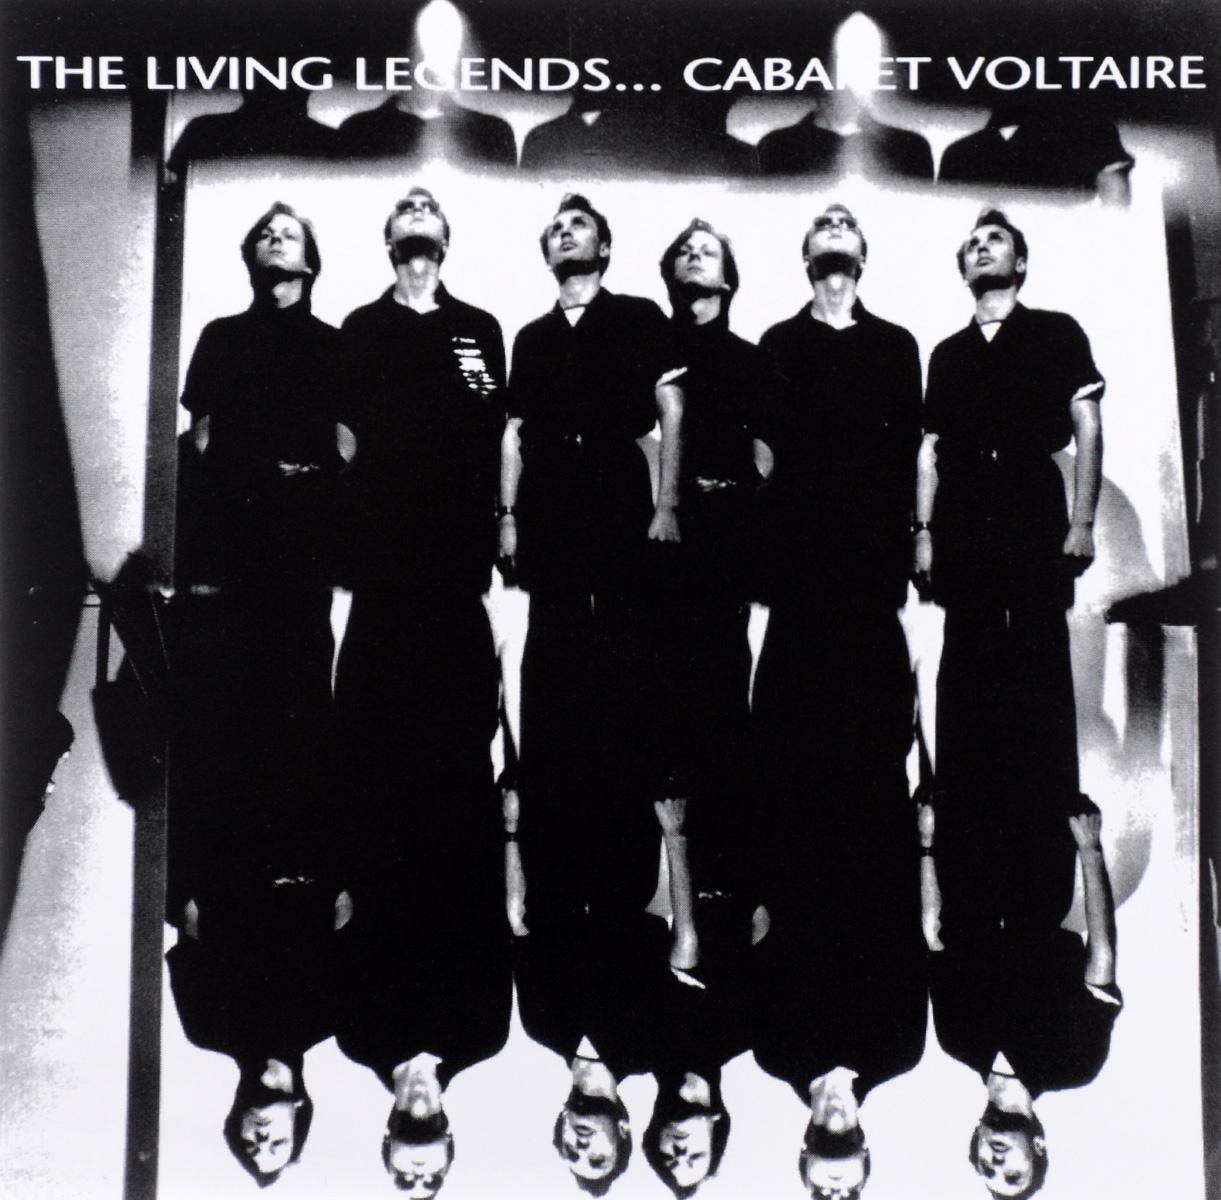 """Cabaret Voltaire"" Cabaret Voltaire. The Living Legends..."